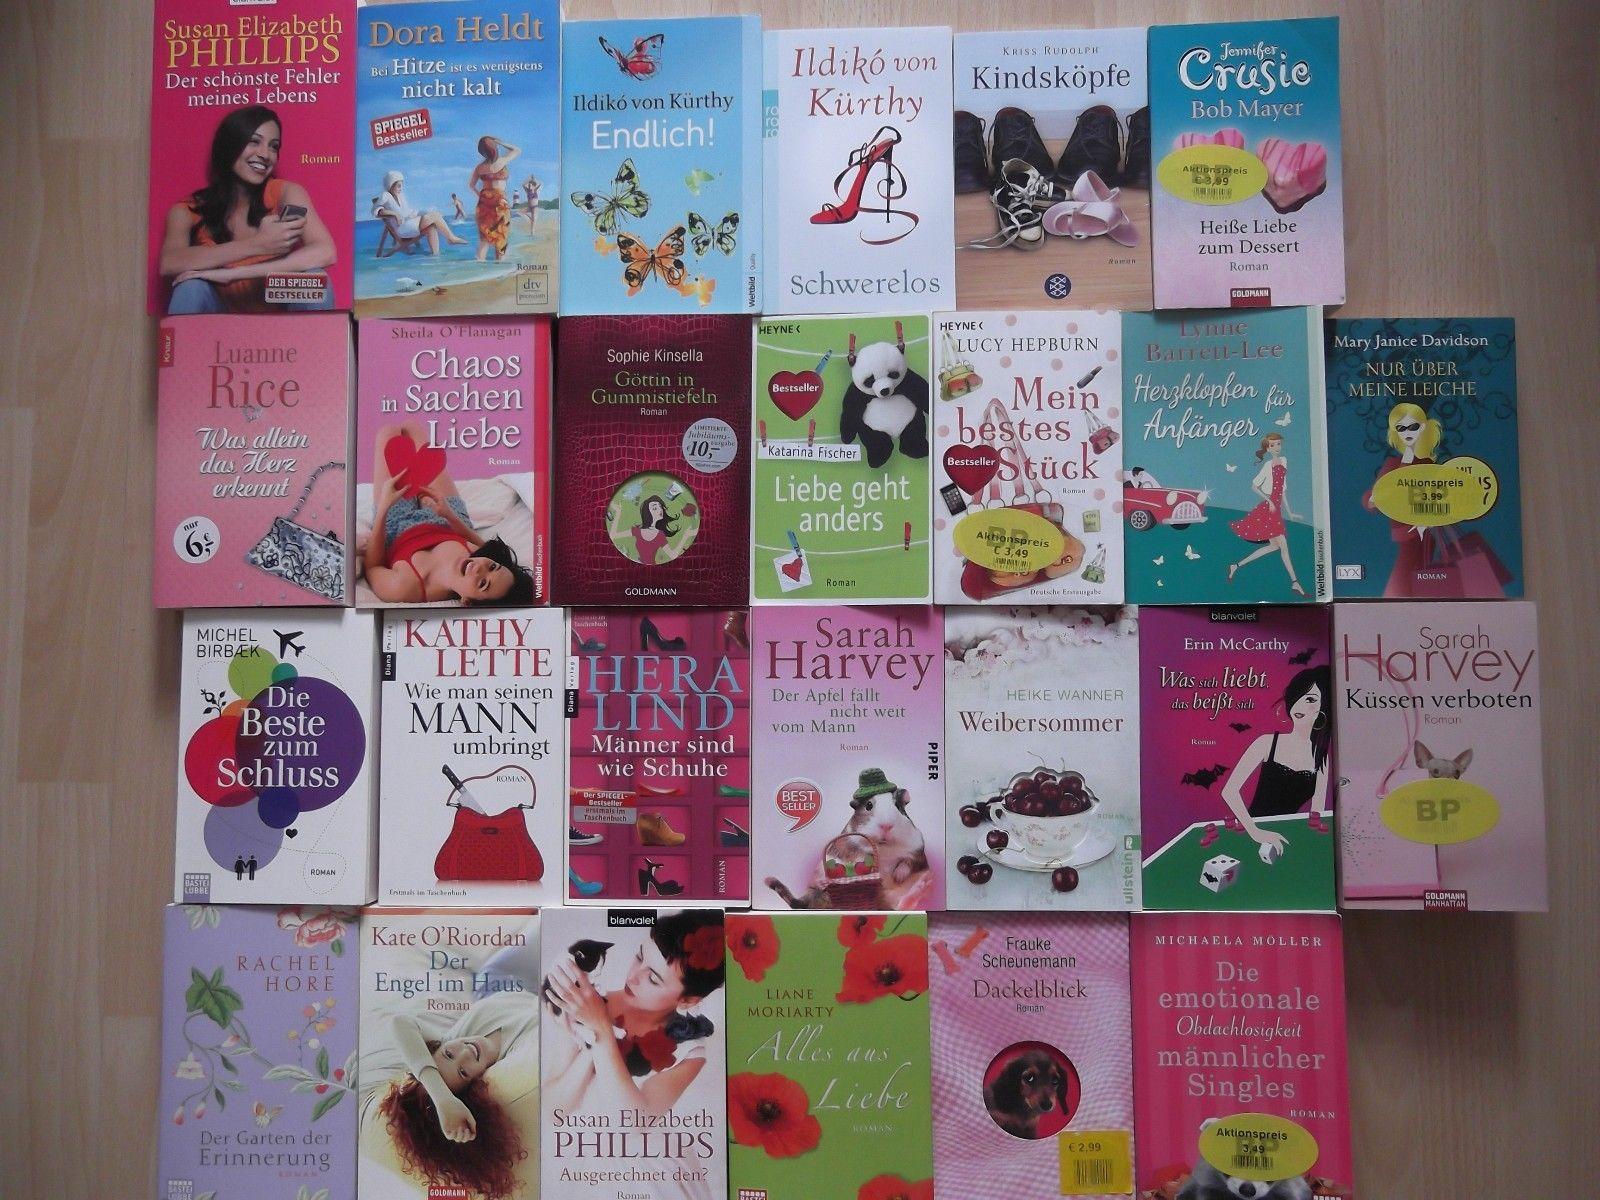 Bücherpaket 26 lustige Romane Dora Heldt, Hera Lindt, Sarah Harvey u. a.